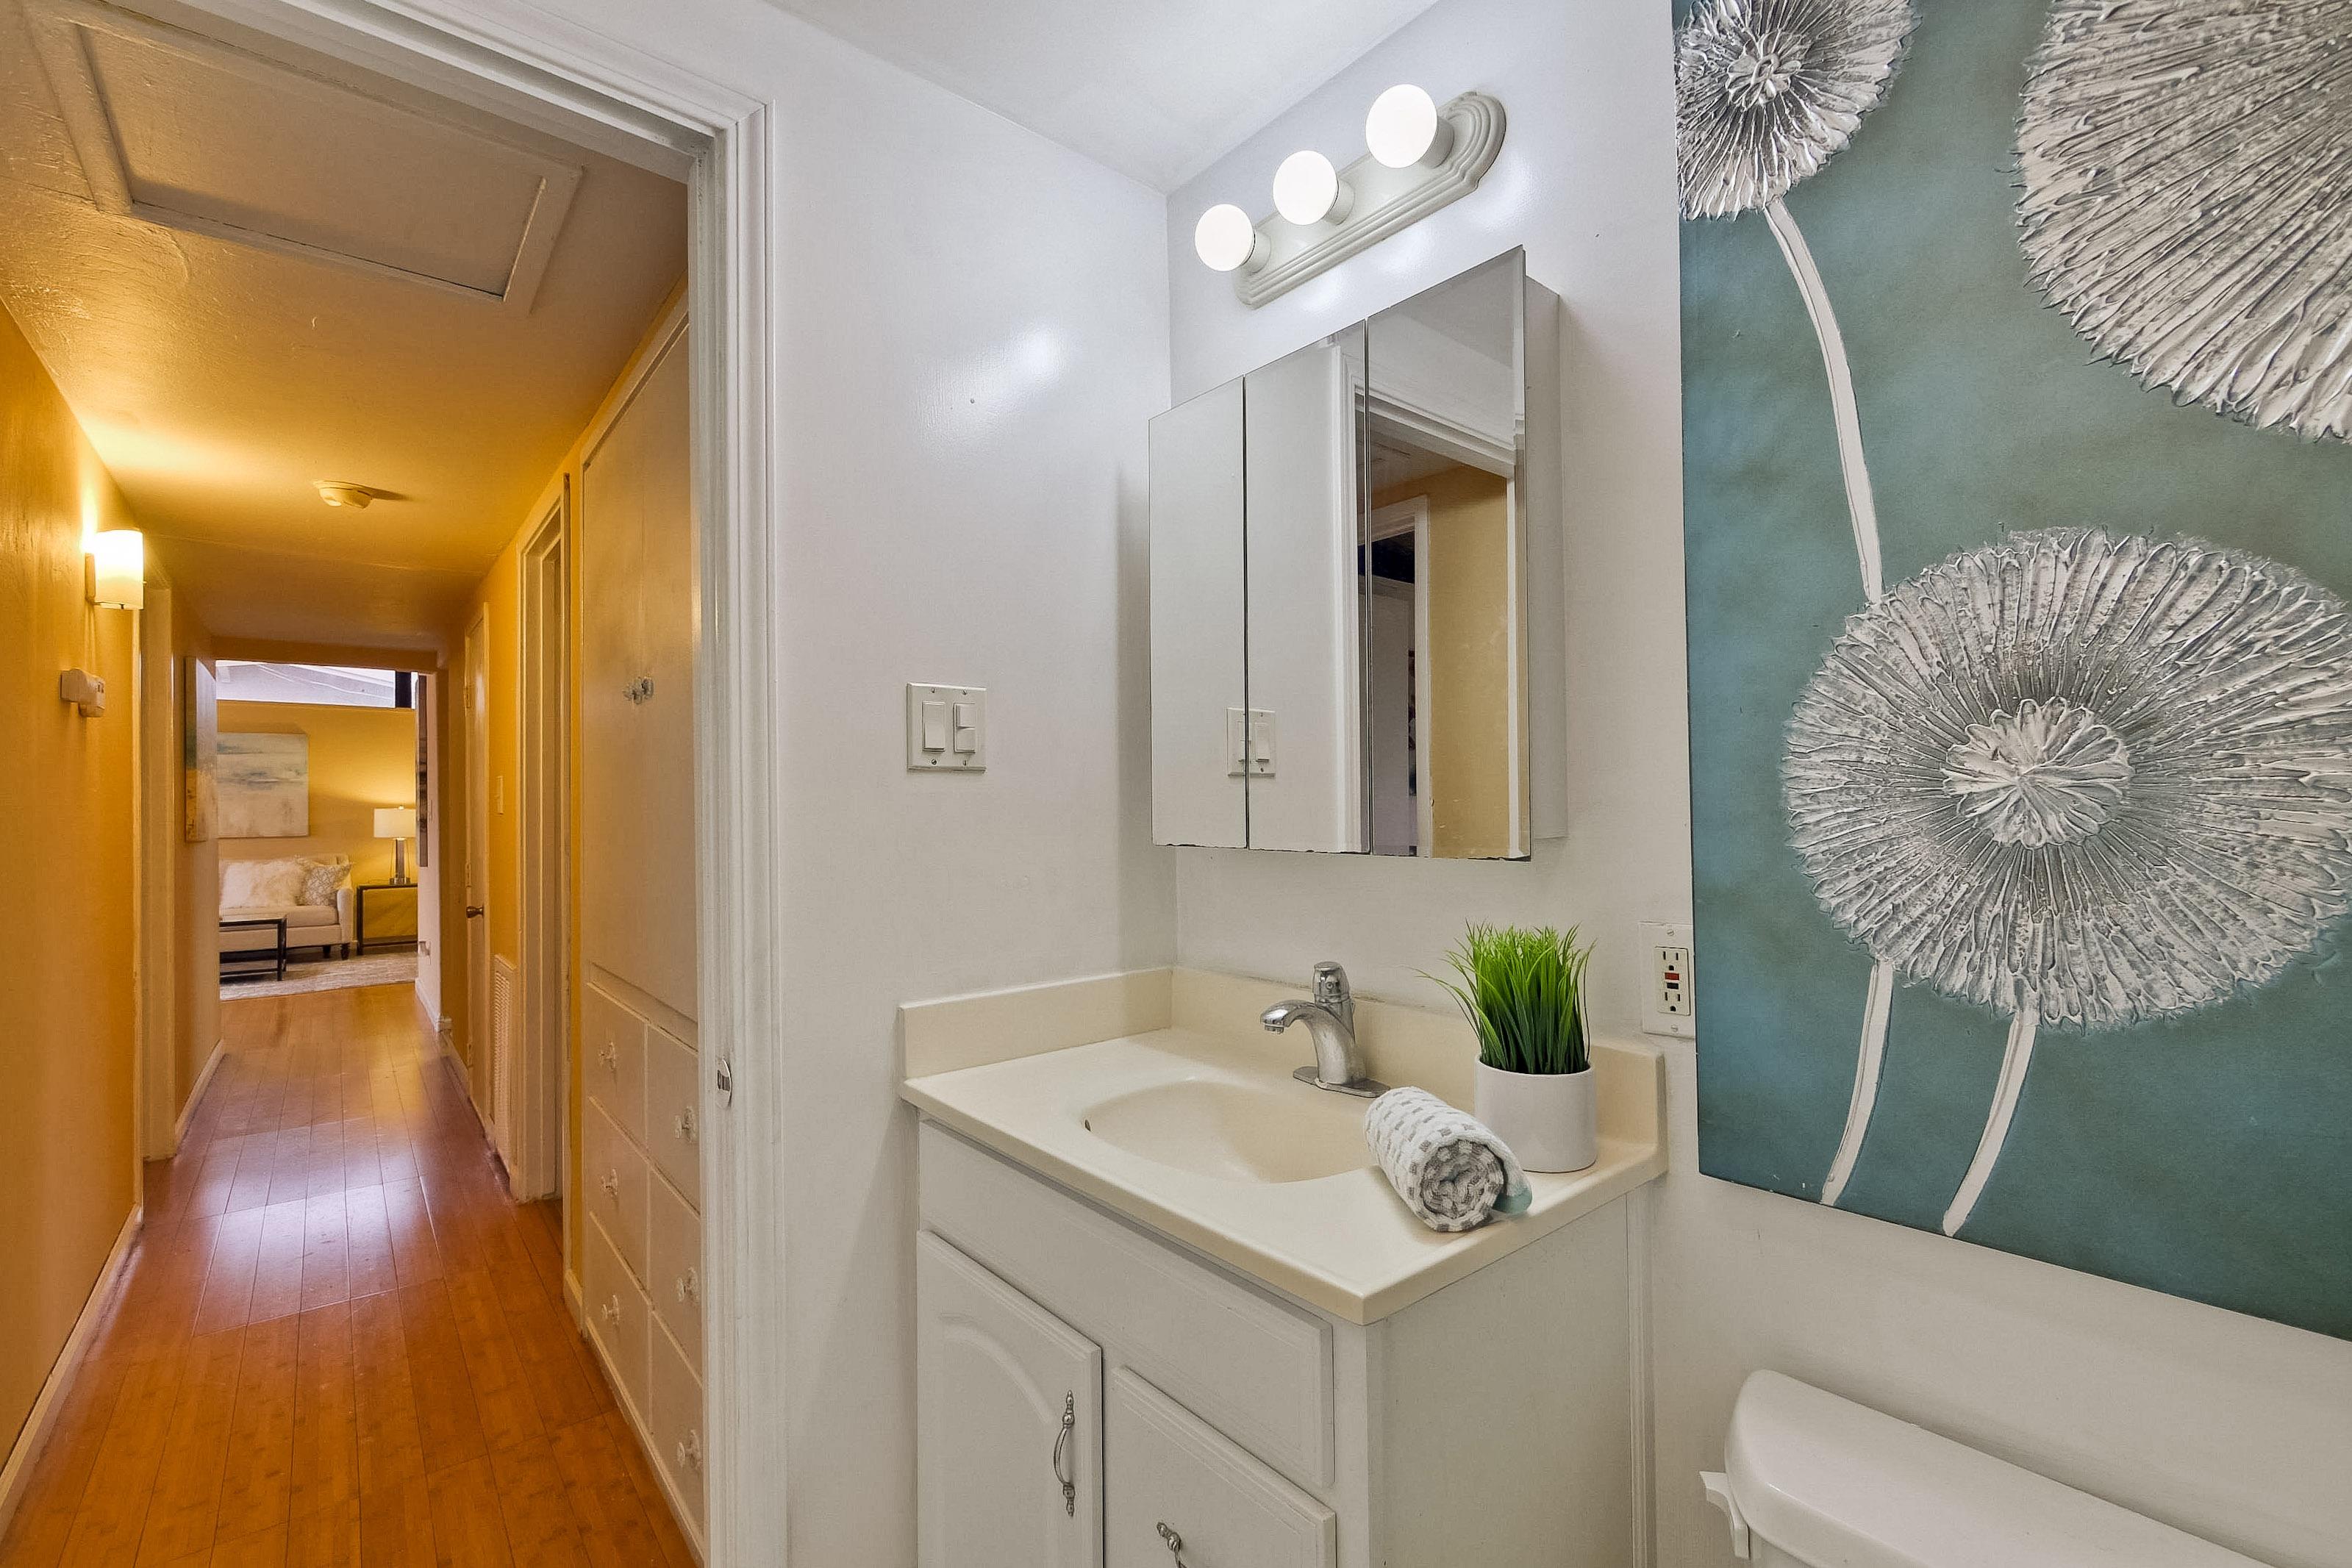 315 Meadowlake Dr, Sunnyvale 94089 - Bathroom 2 (B)